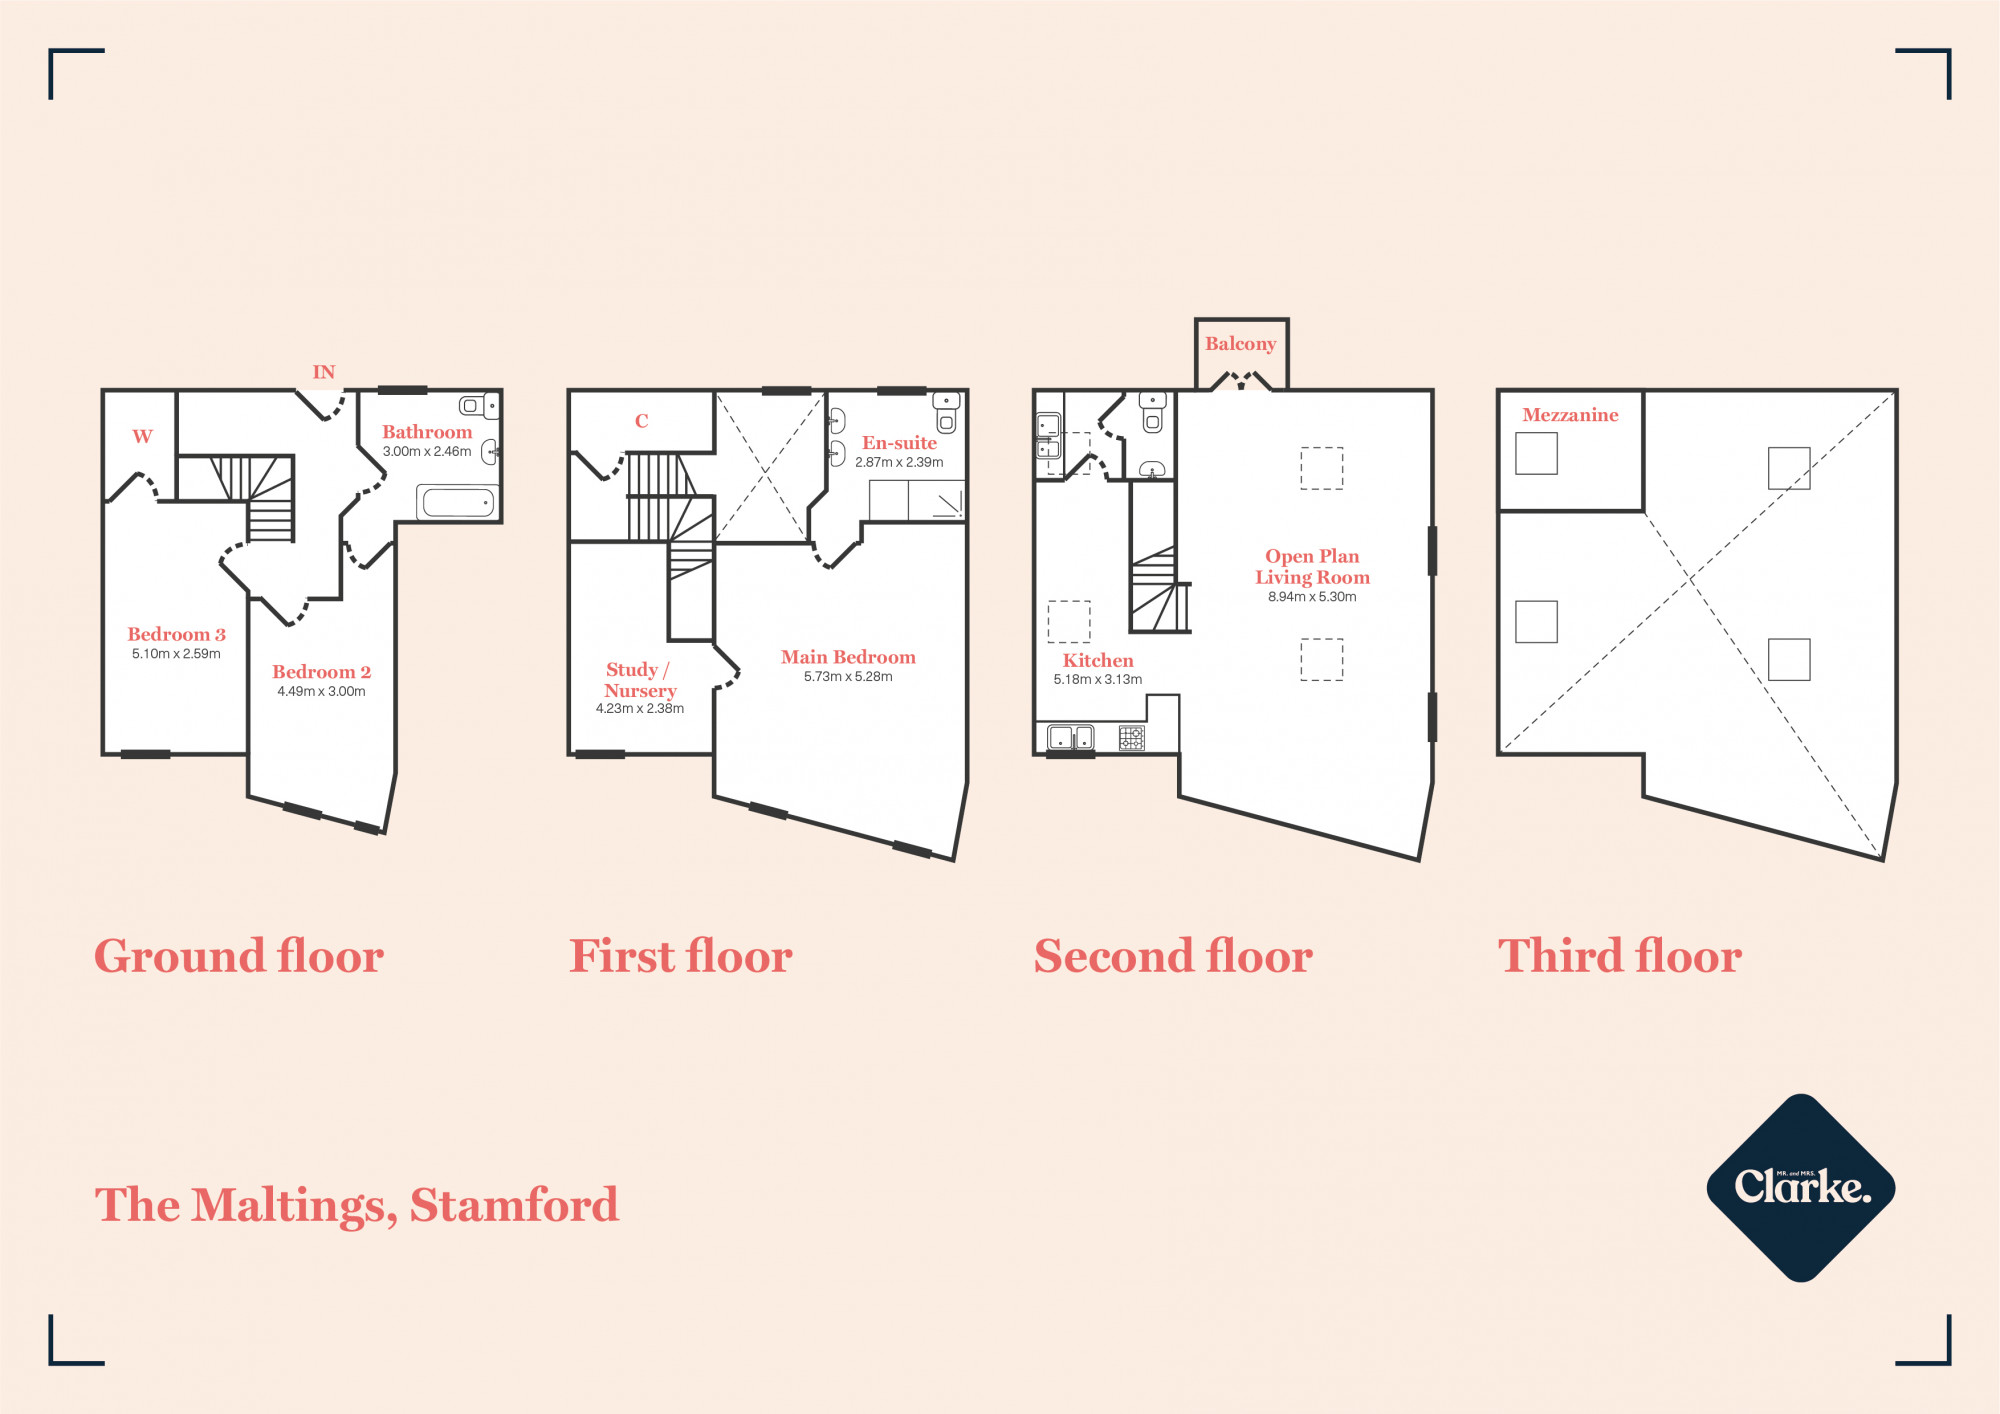 The Maltings, Stamford. Floorplan.